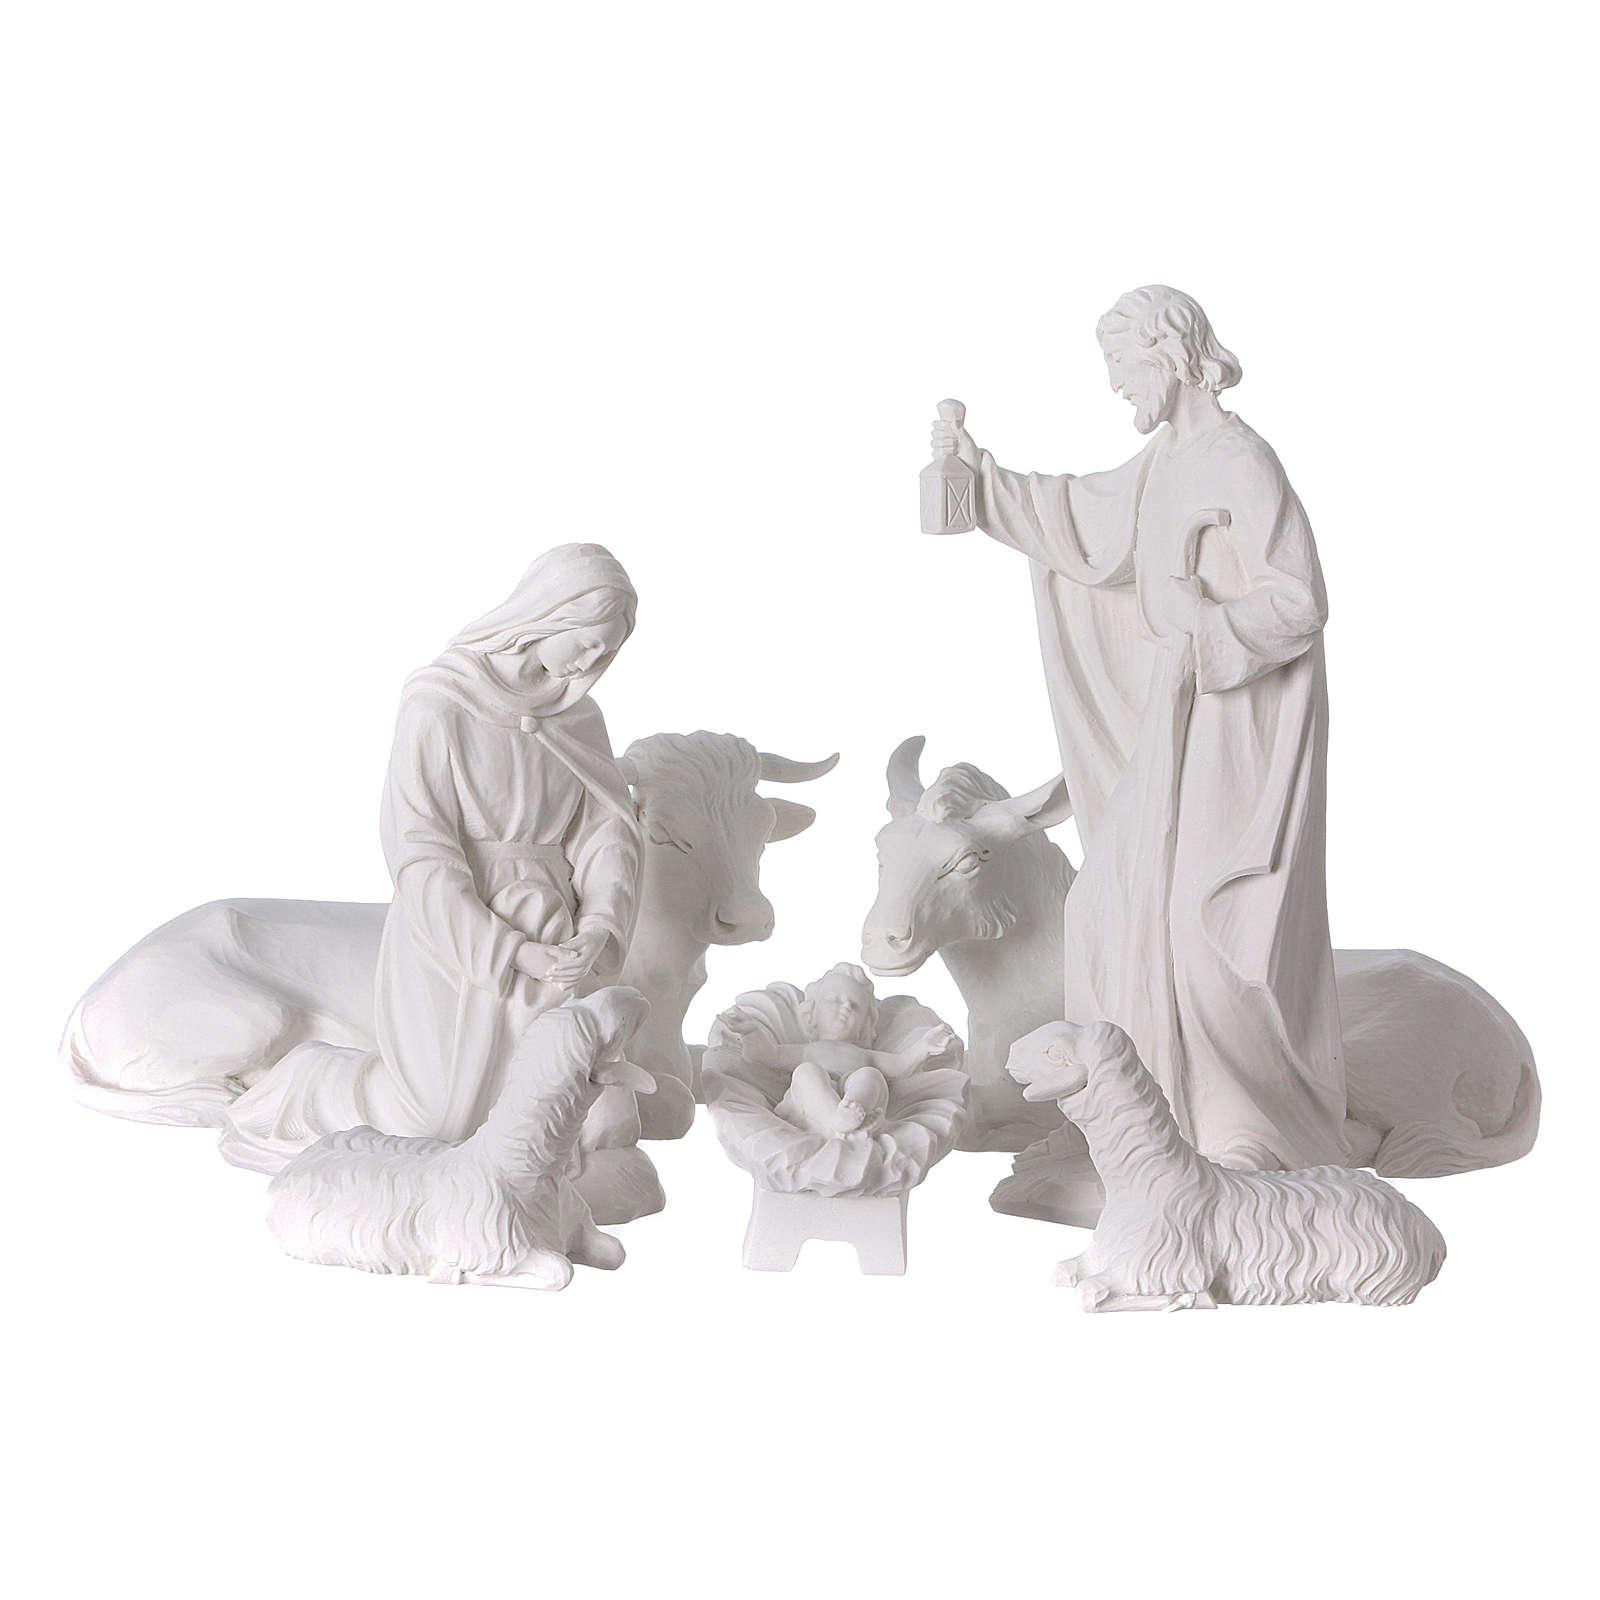 Komplett-Krippe, 30 cm, Marmorpulver, 7 Figuren 4